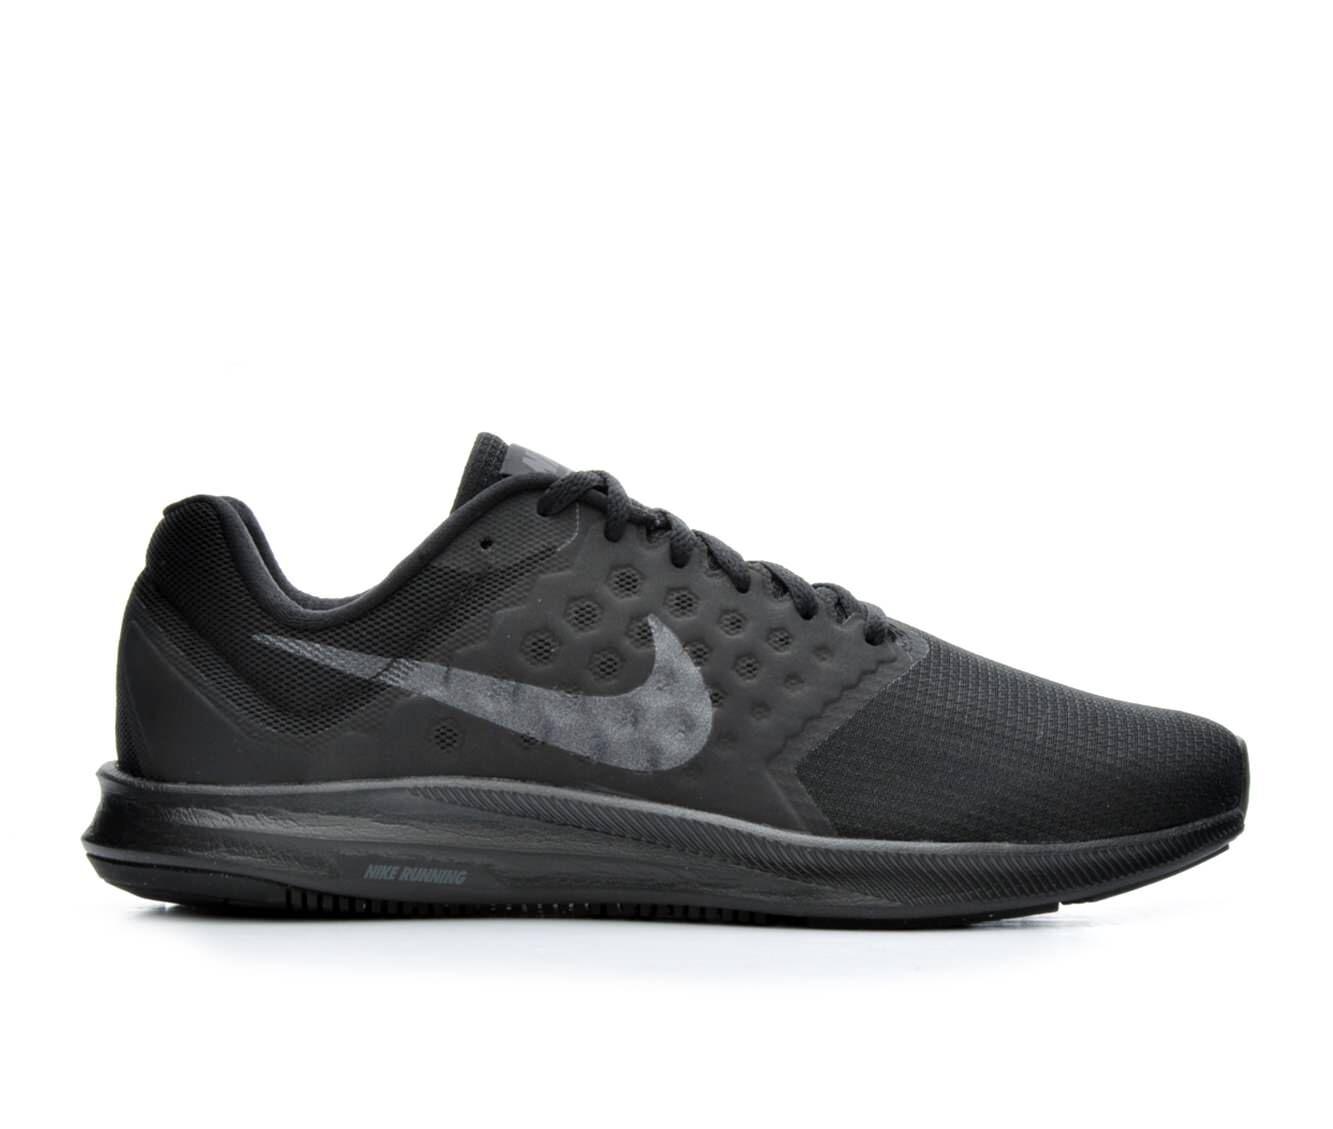 Men's Nike Downshifter 7 Running Shoes Blk/Blk 001